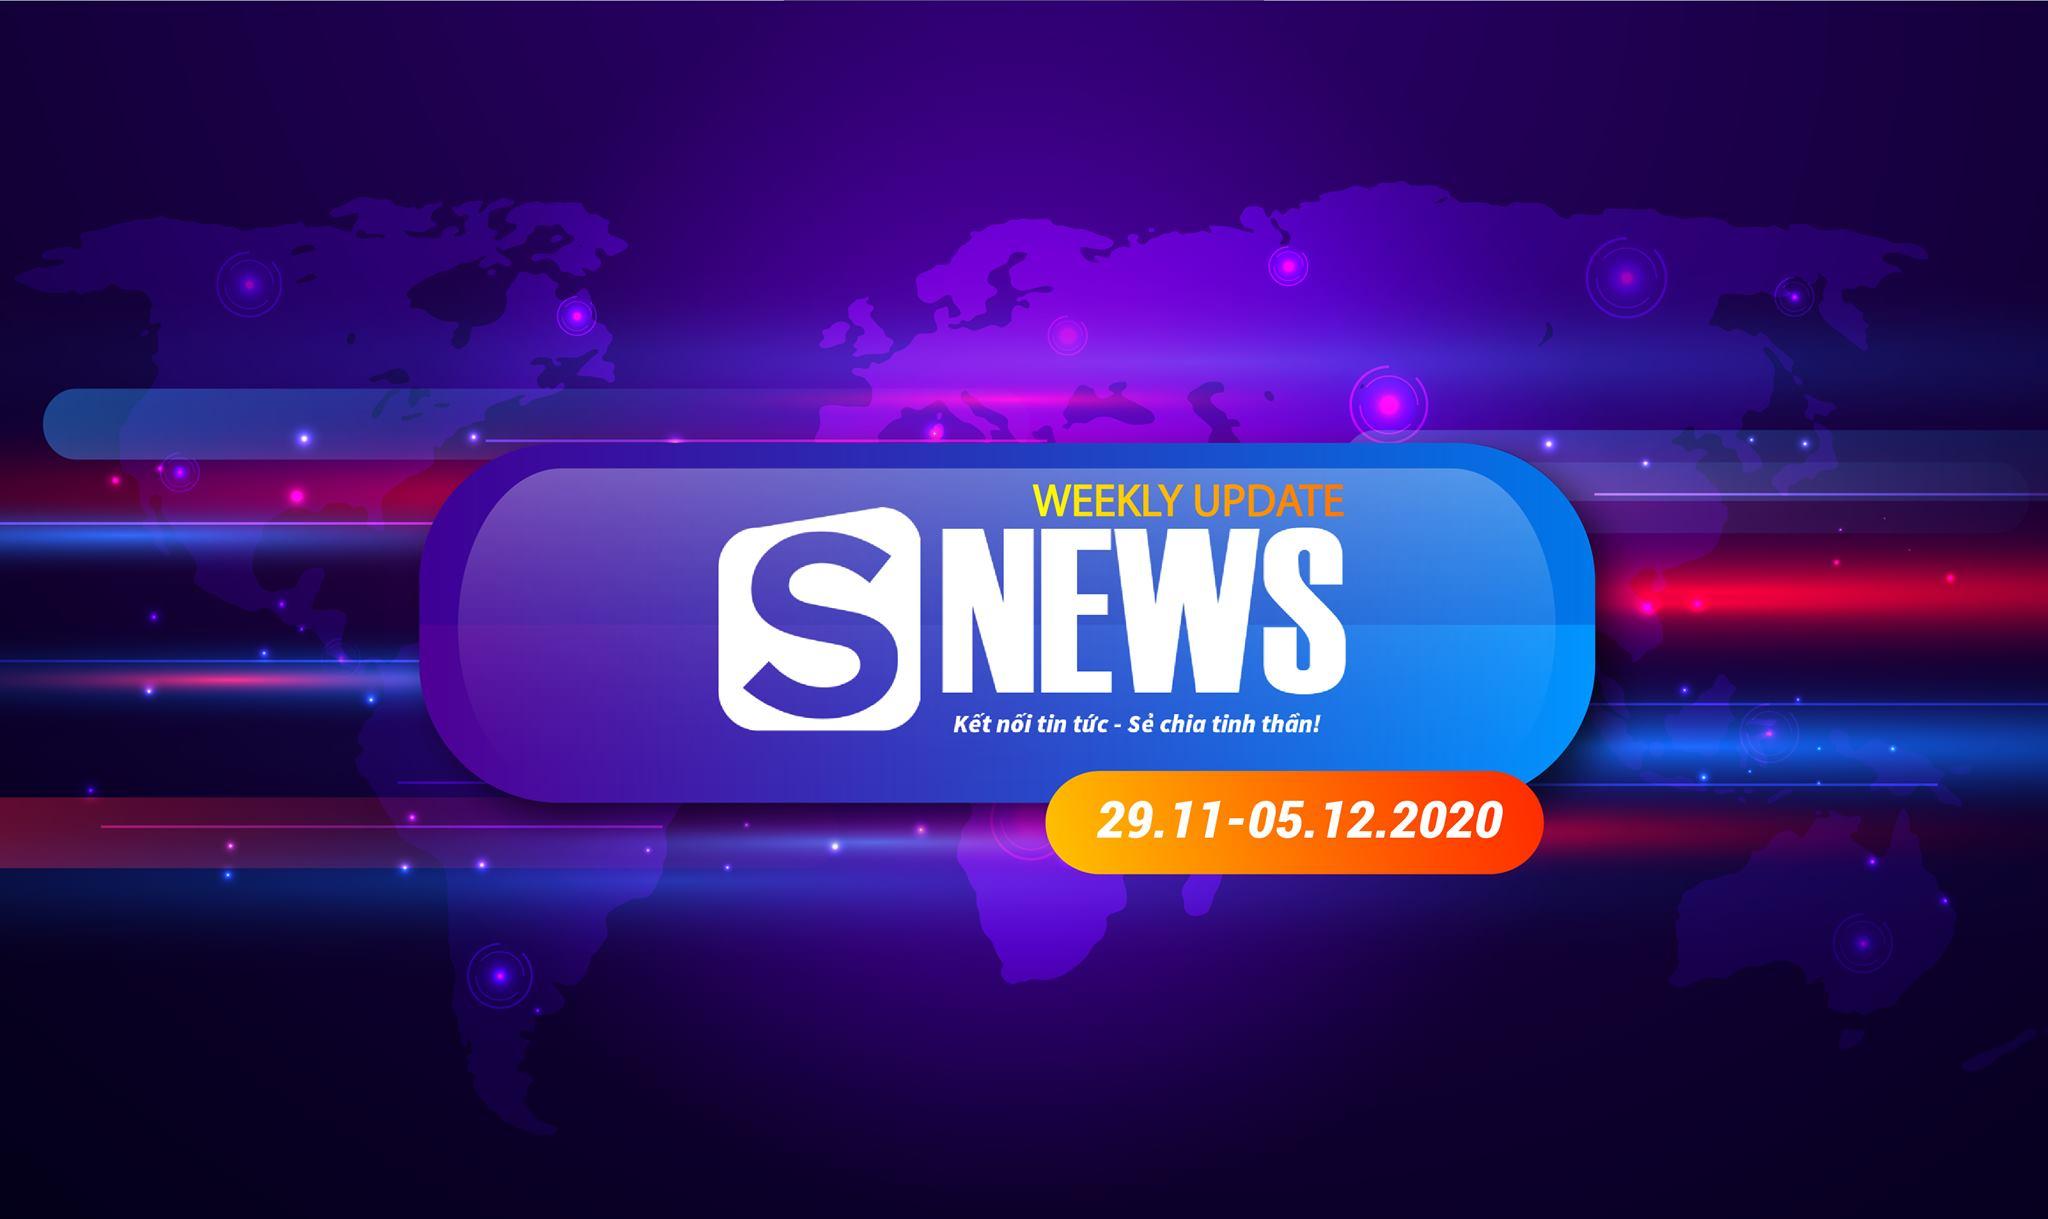 Tổng hợp tin tức Sapo tuần qua: 29.11 - 05.12.2020